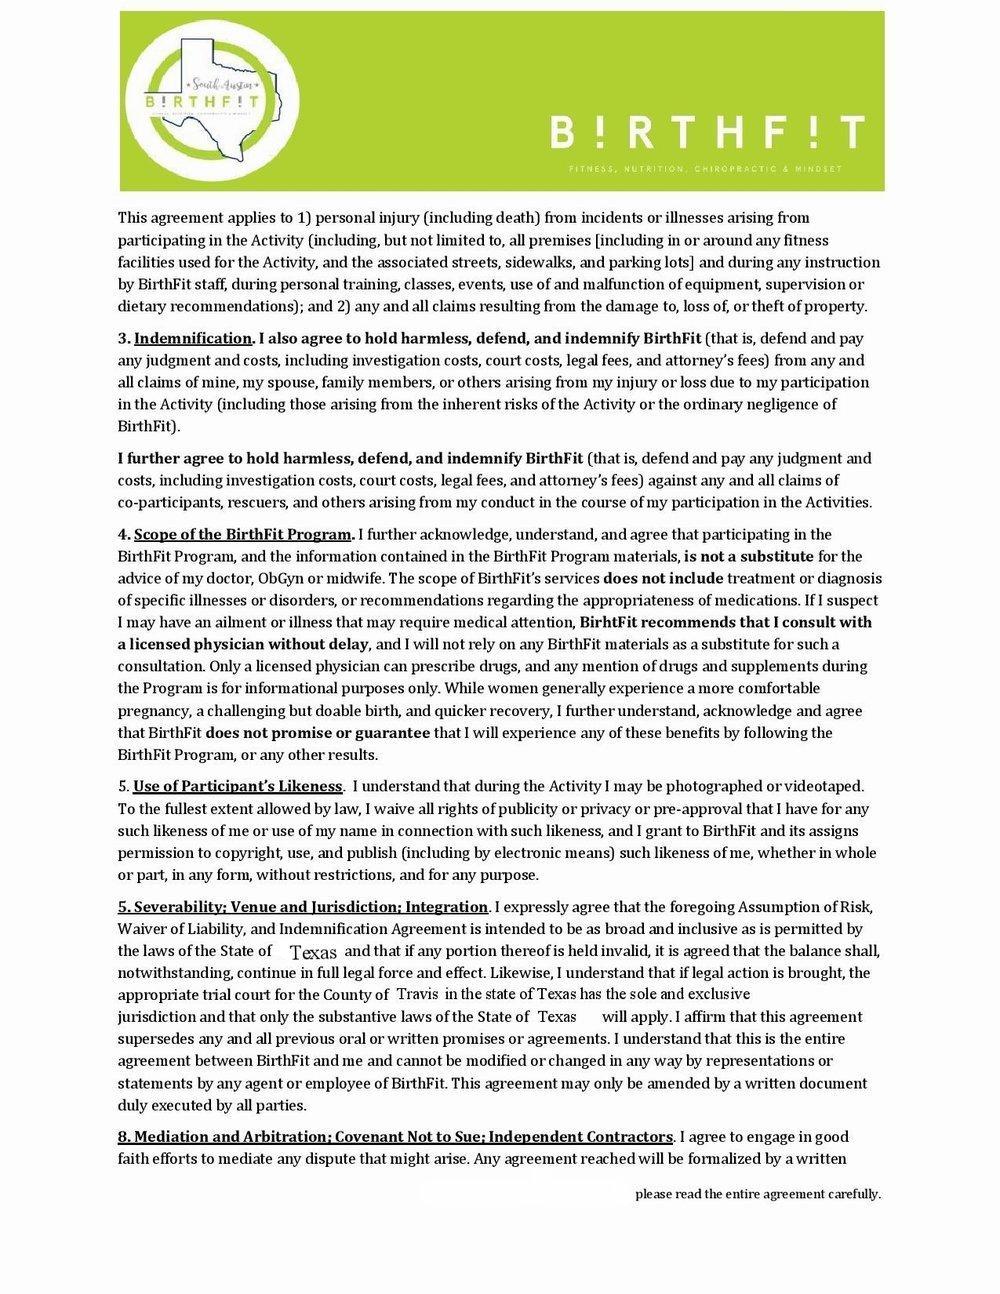 BIRTHFIT South Austin Waiver (1)-page-002.jpg